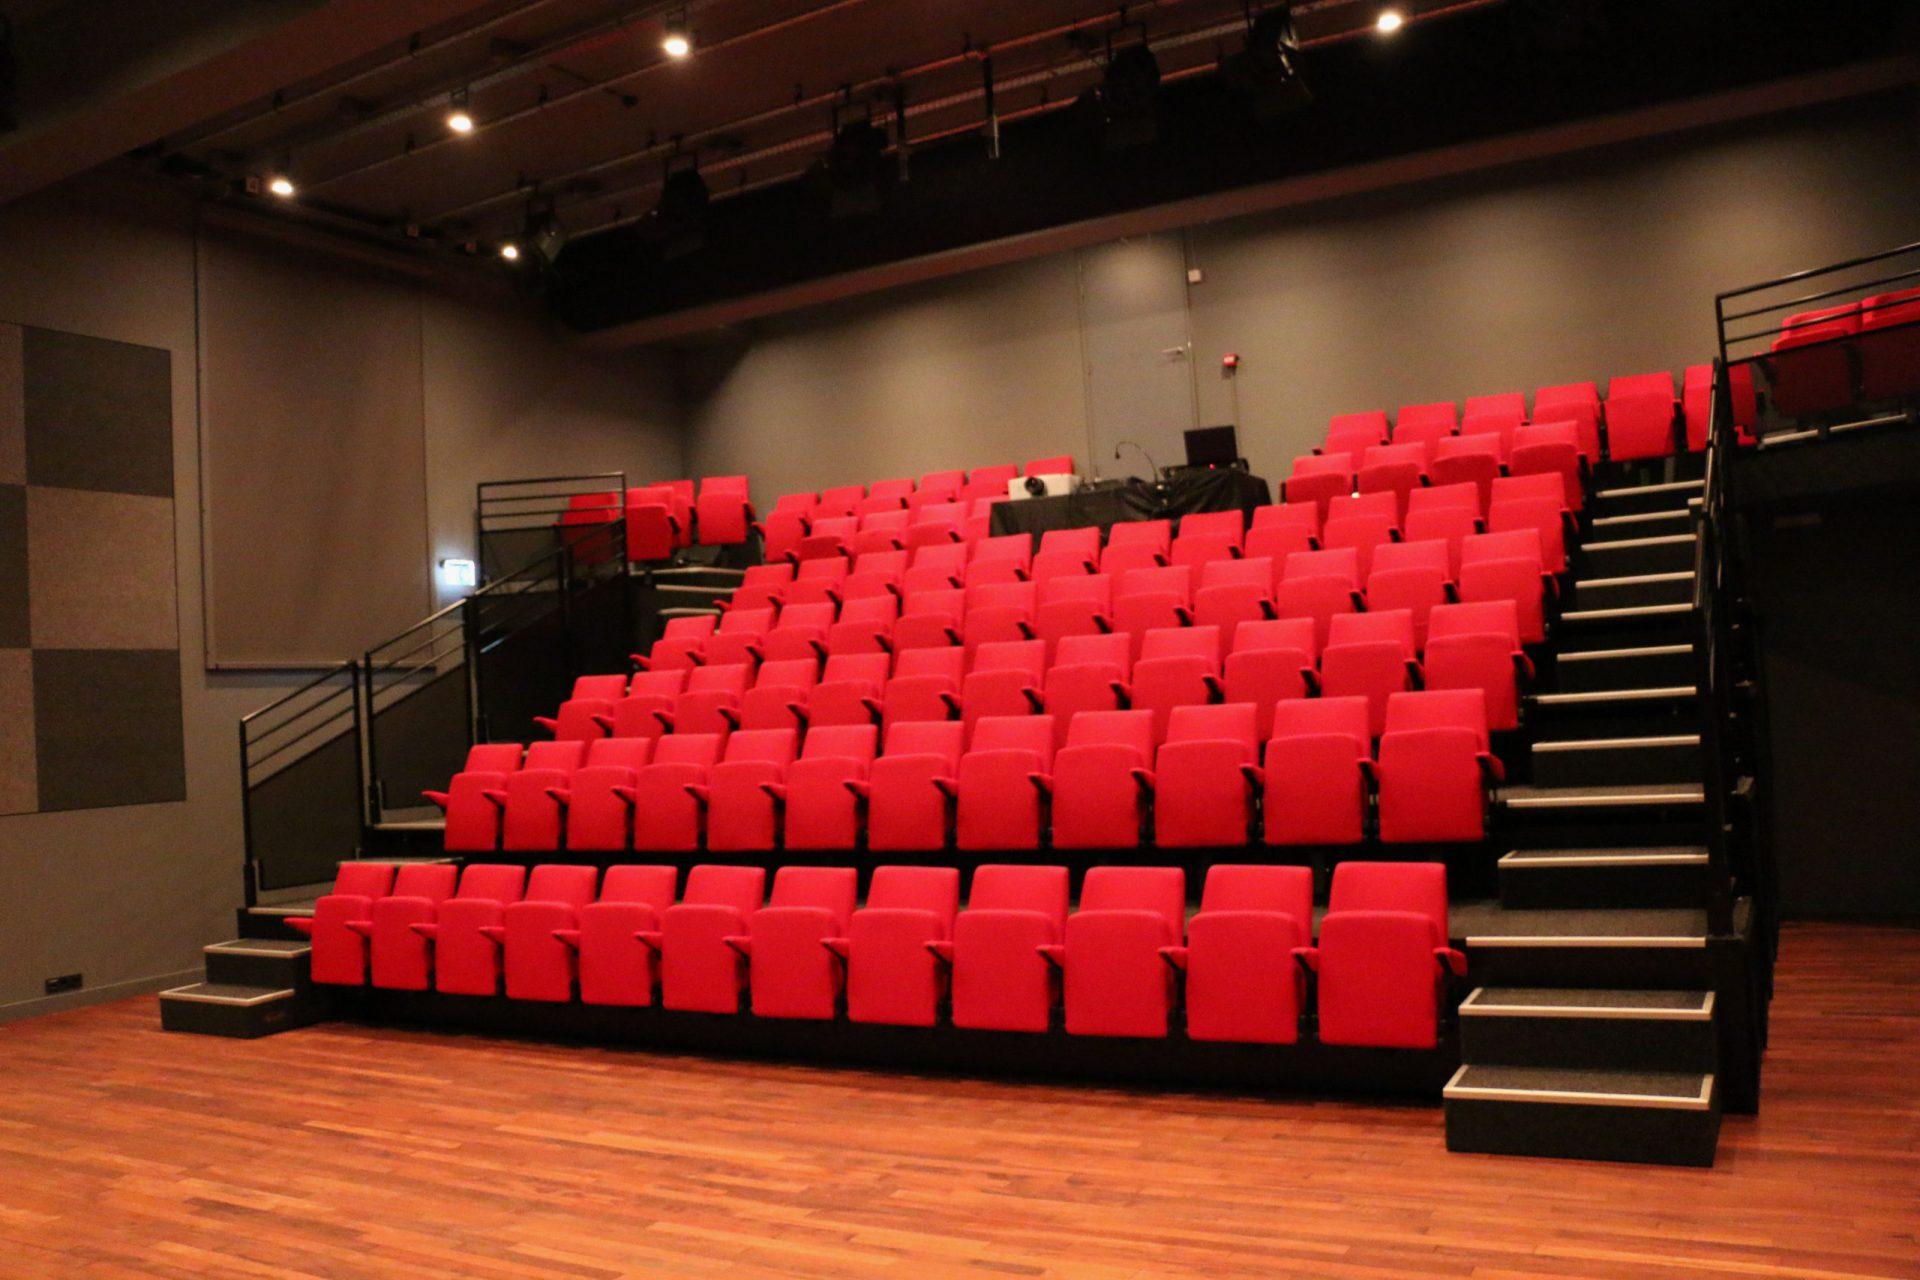 Benedenzaal Theater a/d Rijn - foto Menno van der Meulen